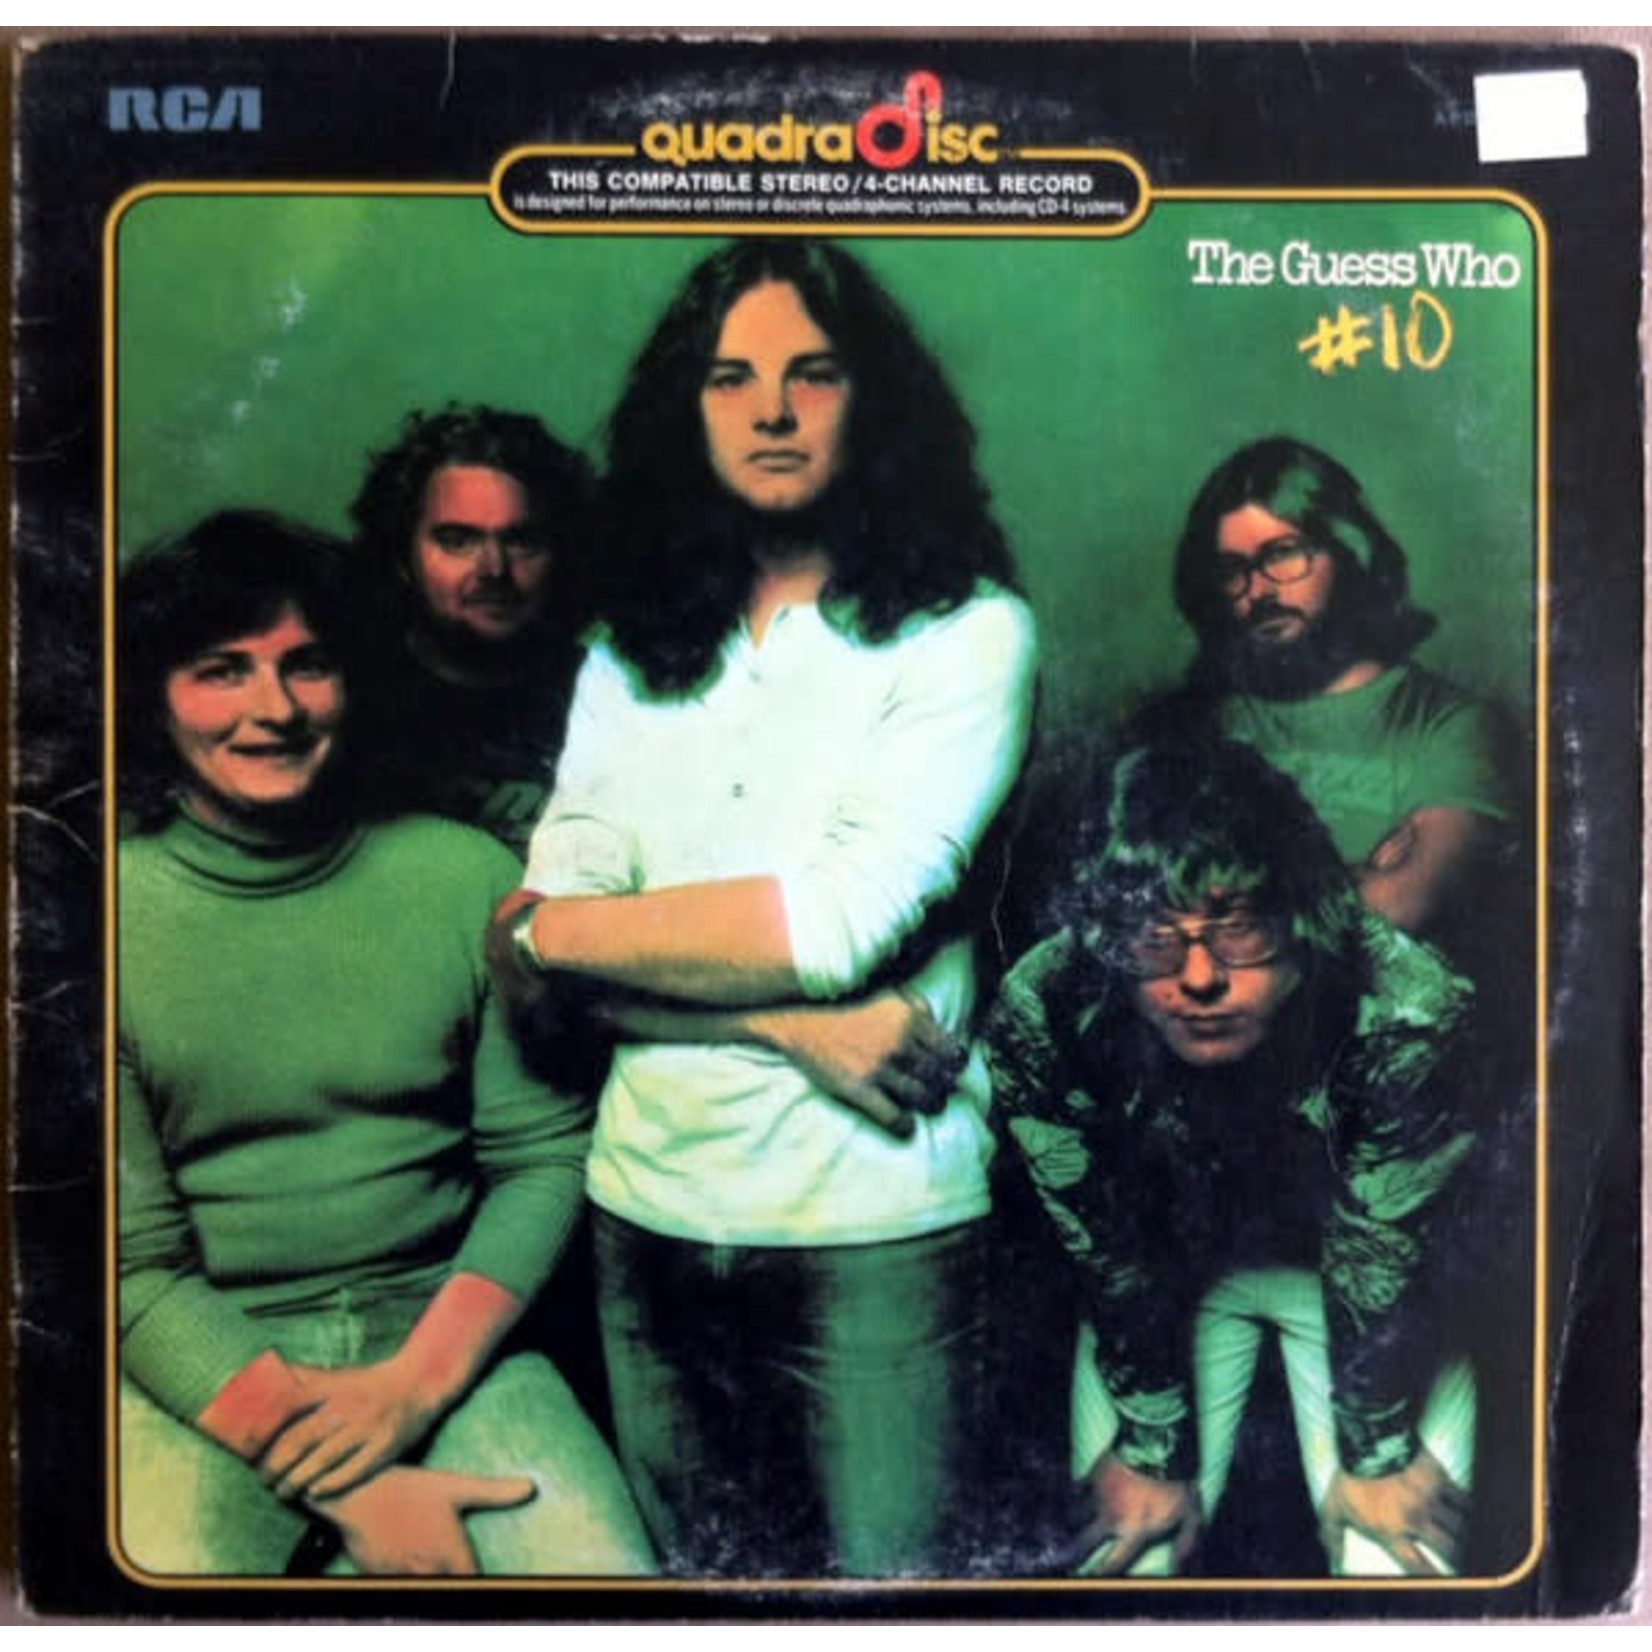 Vinyl The Guess Who - # 10  (Quad Version)